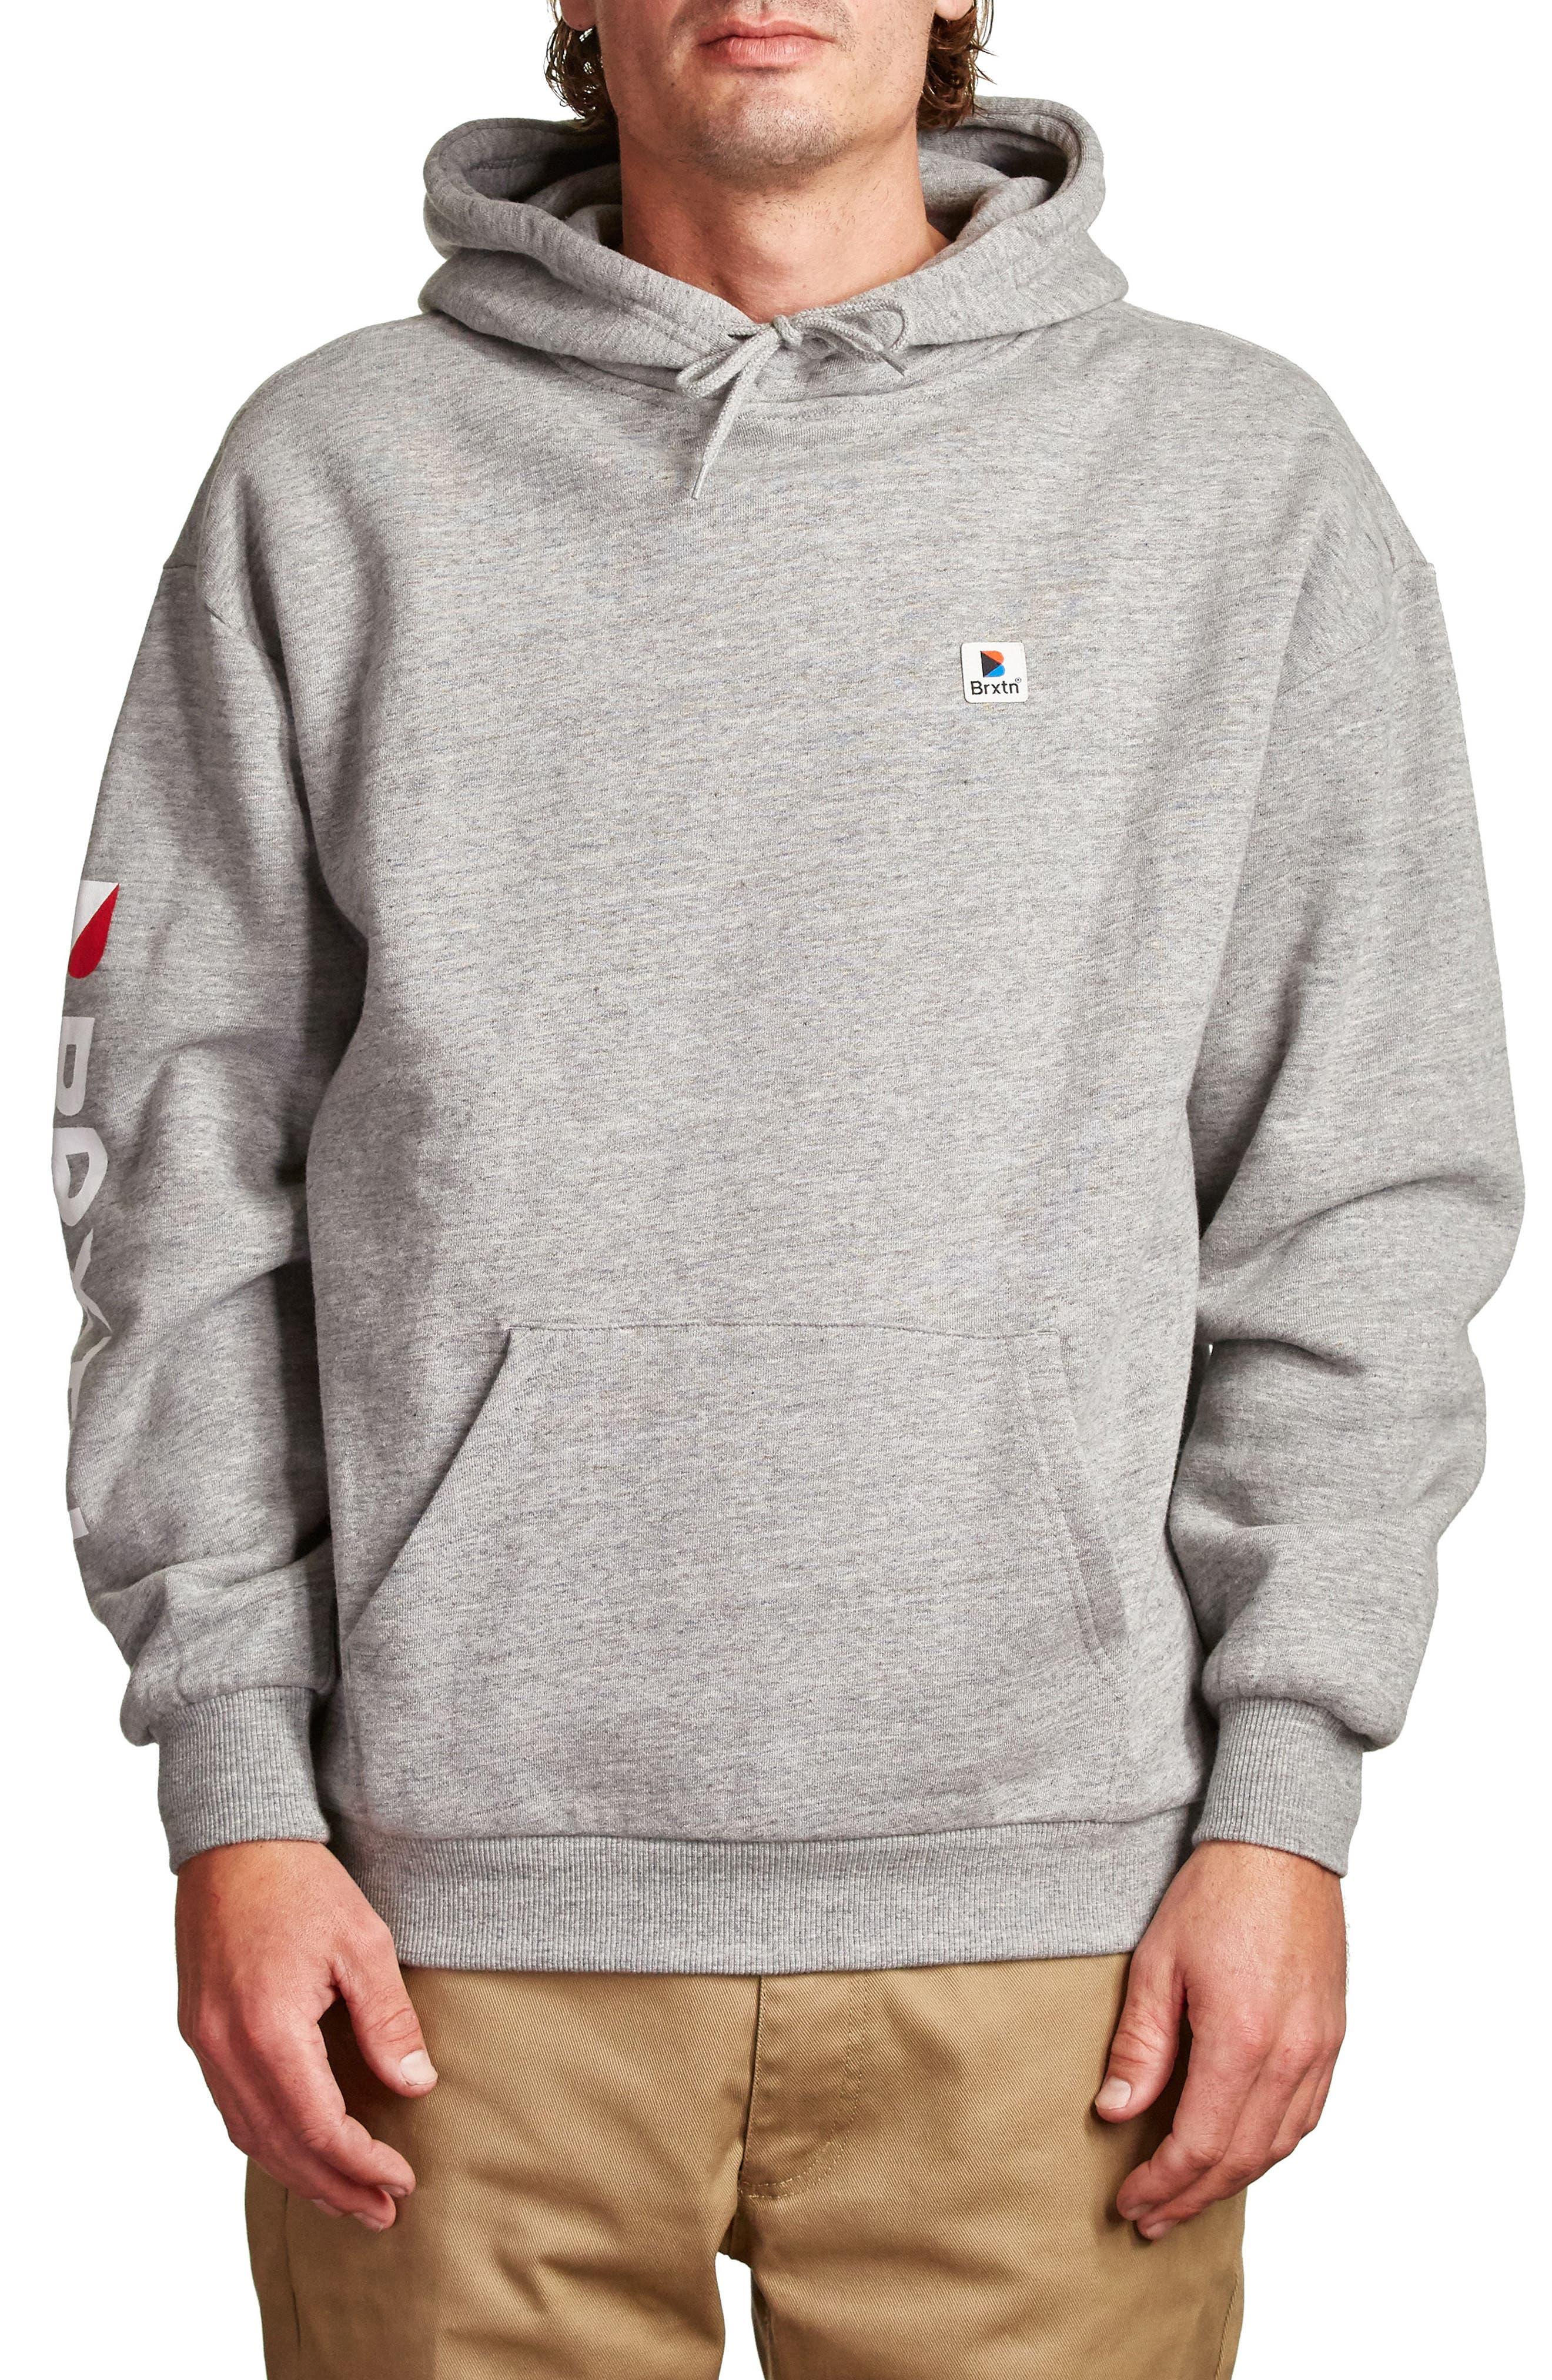 Stowell Hoodie Sweatshirt,                         Main,                         color, Heather Grey